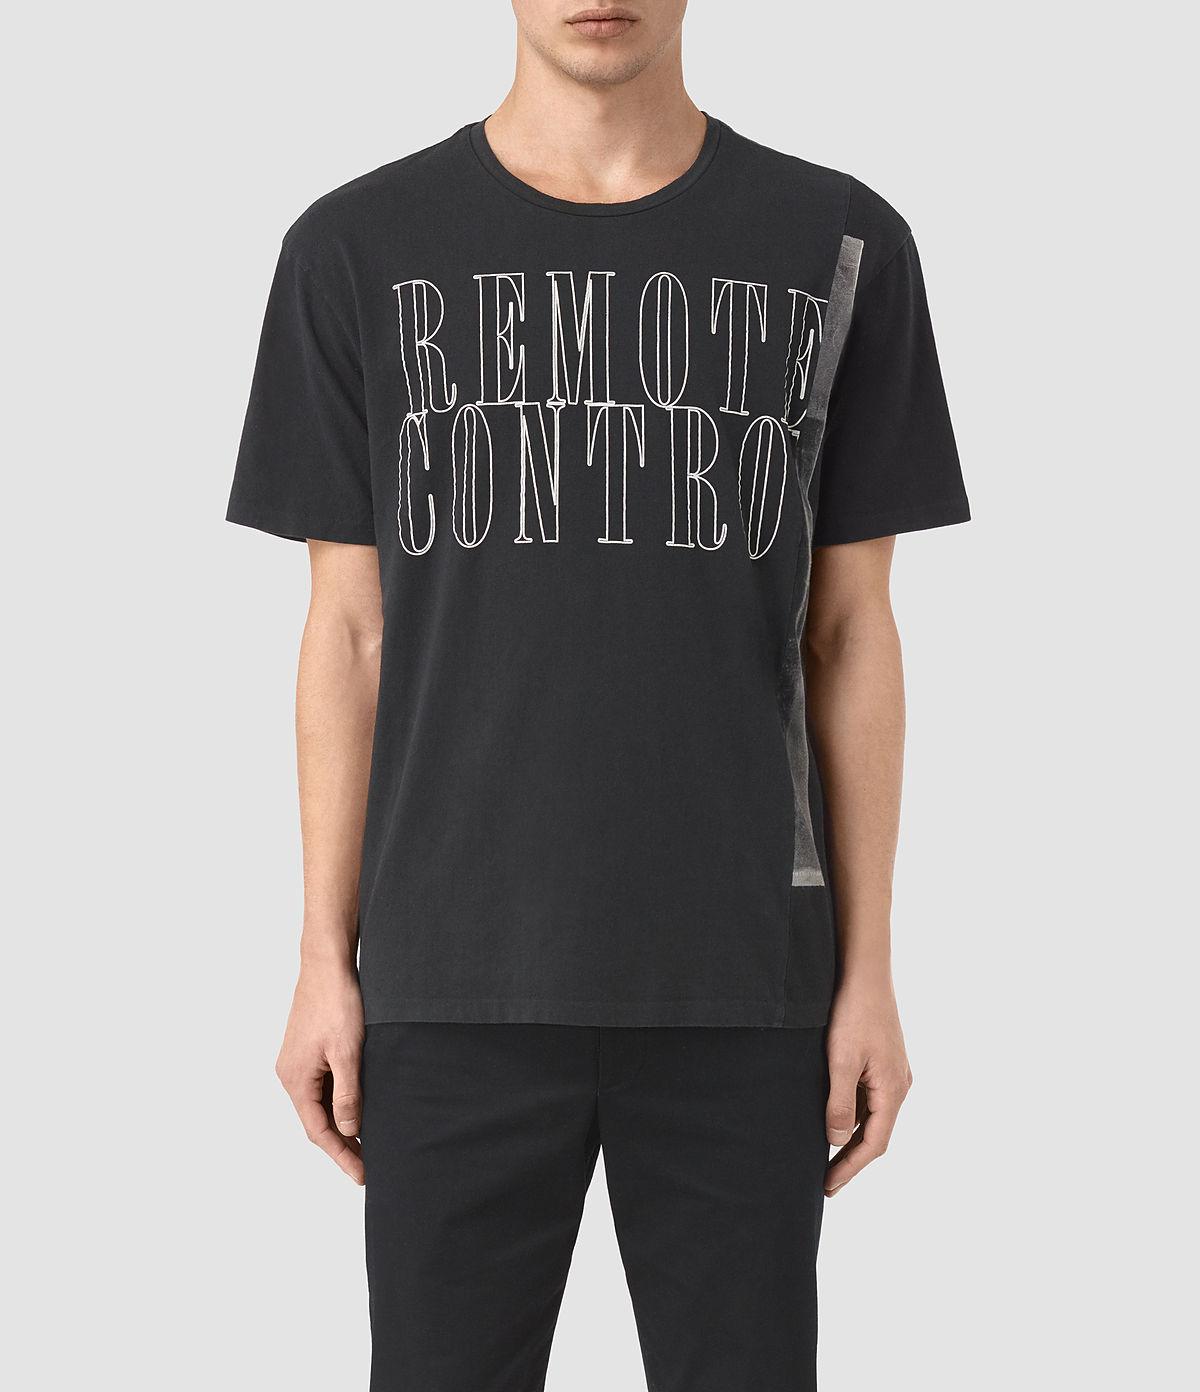 linear-control-crew-t-shirt